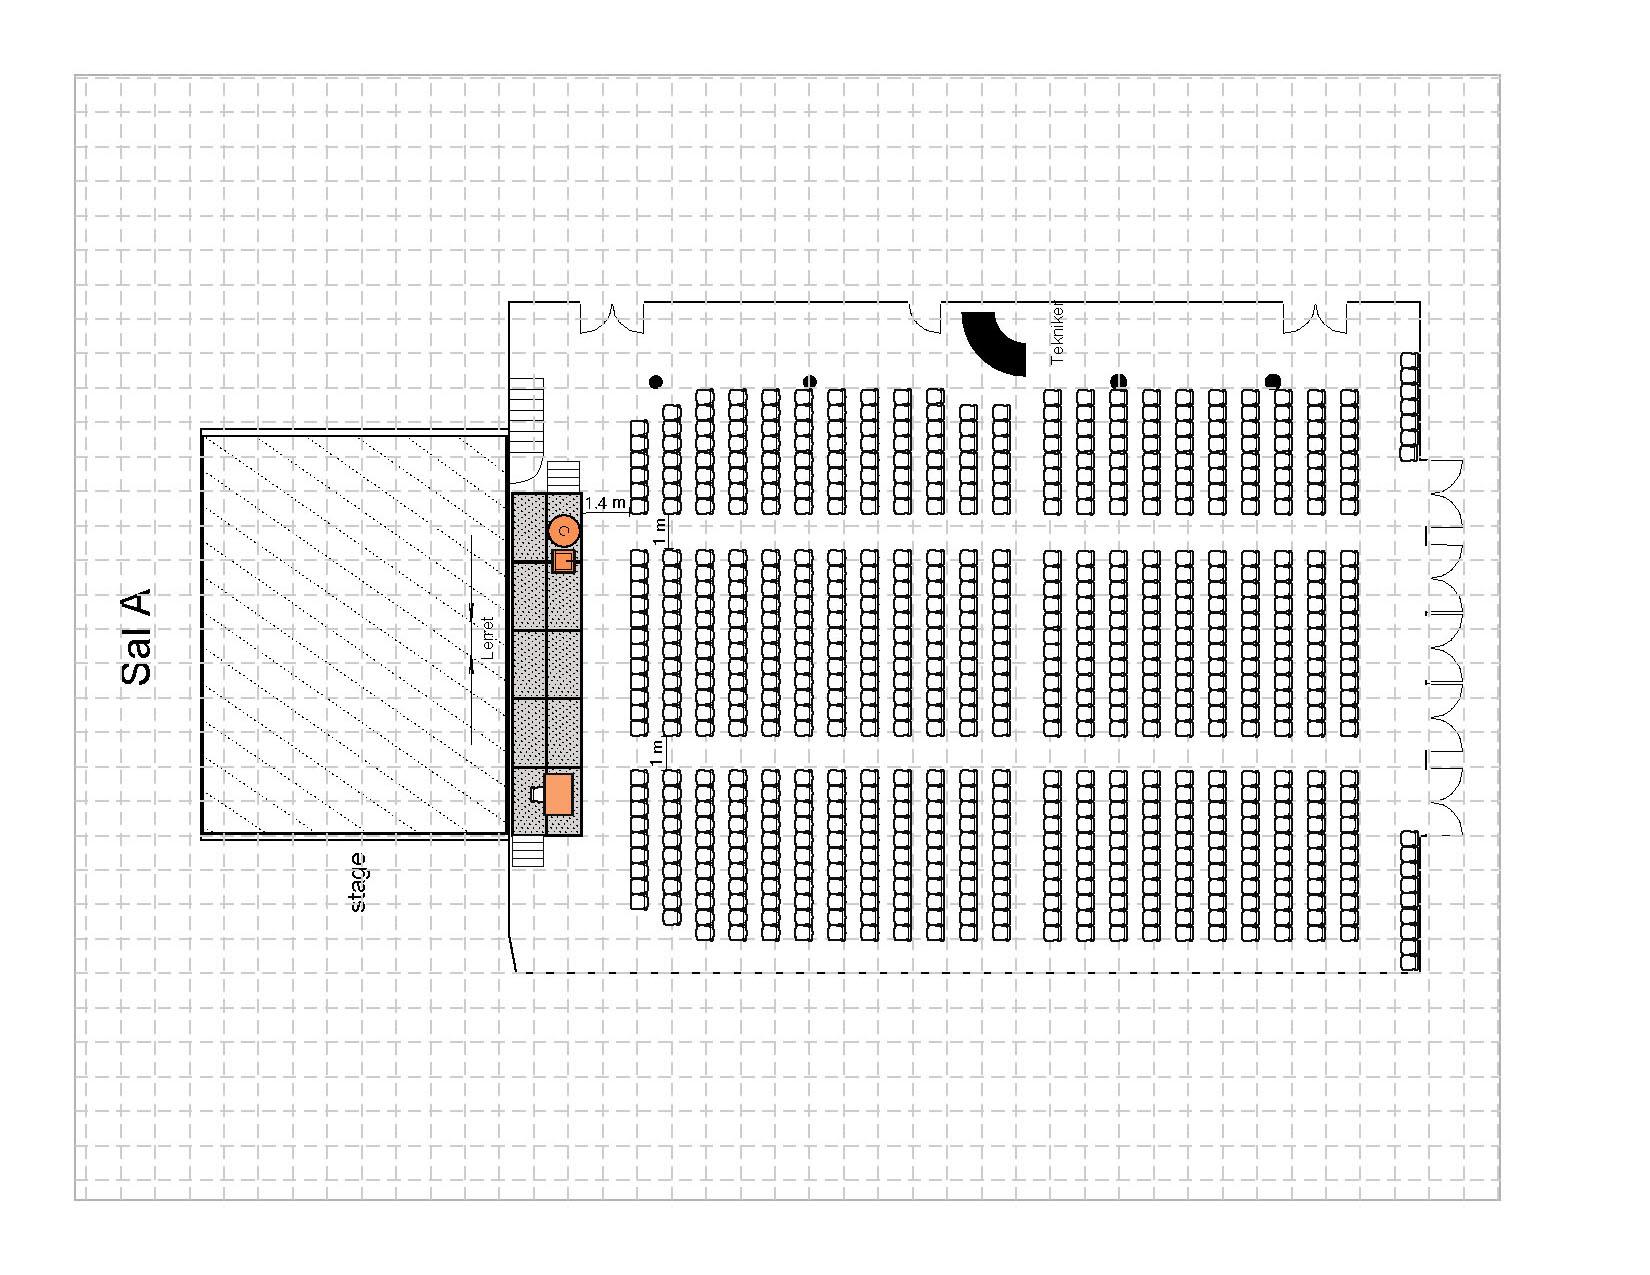 Kino 690 plasser